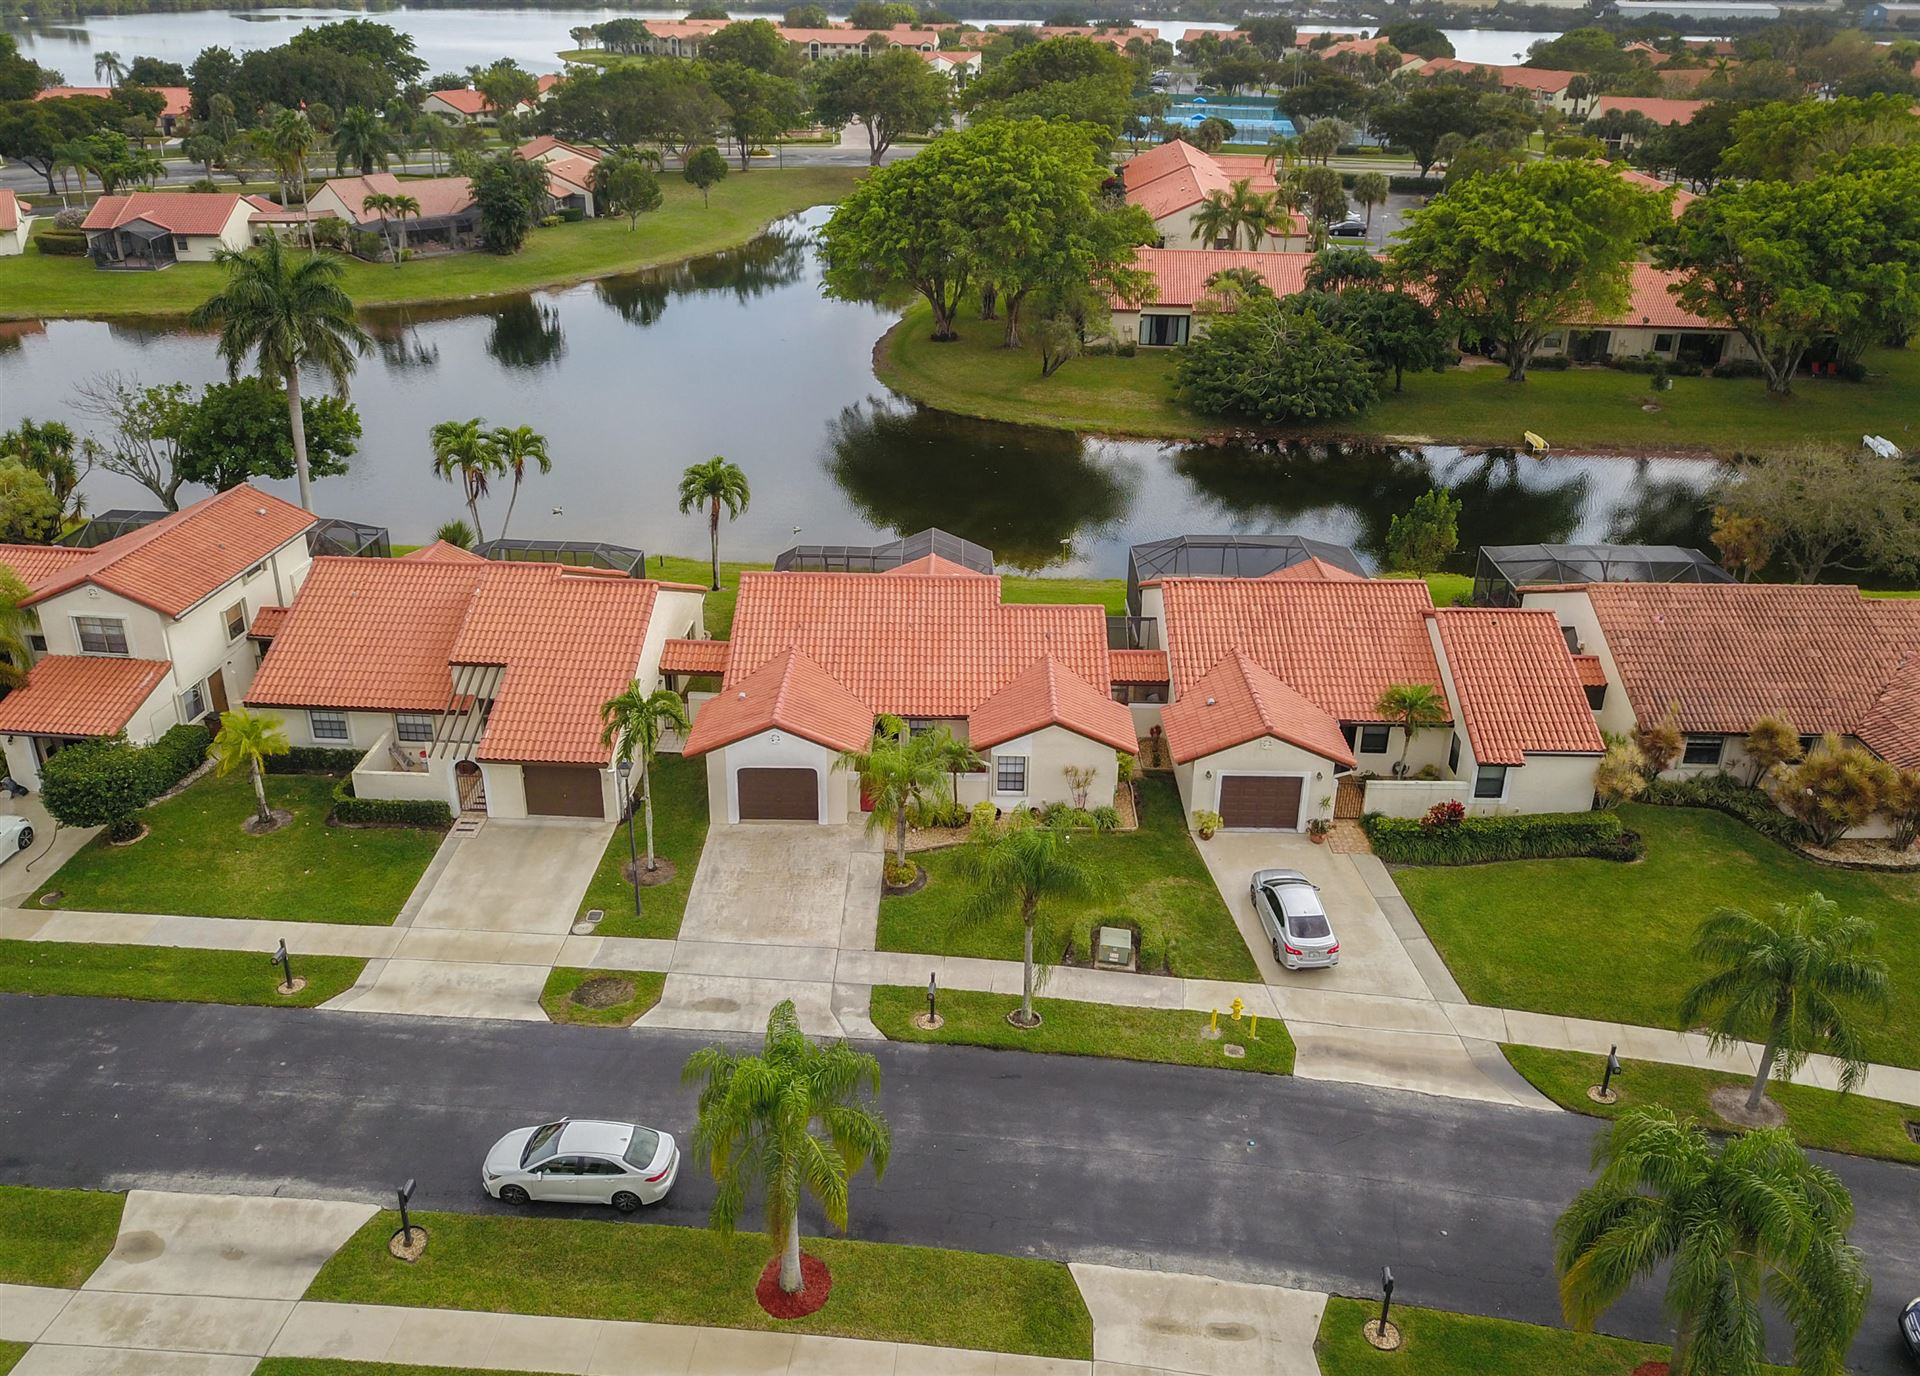 Photo of 10 Capitol Court, Deerfield Beach, FL 33442 (MLS # RX-10693330)